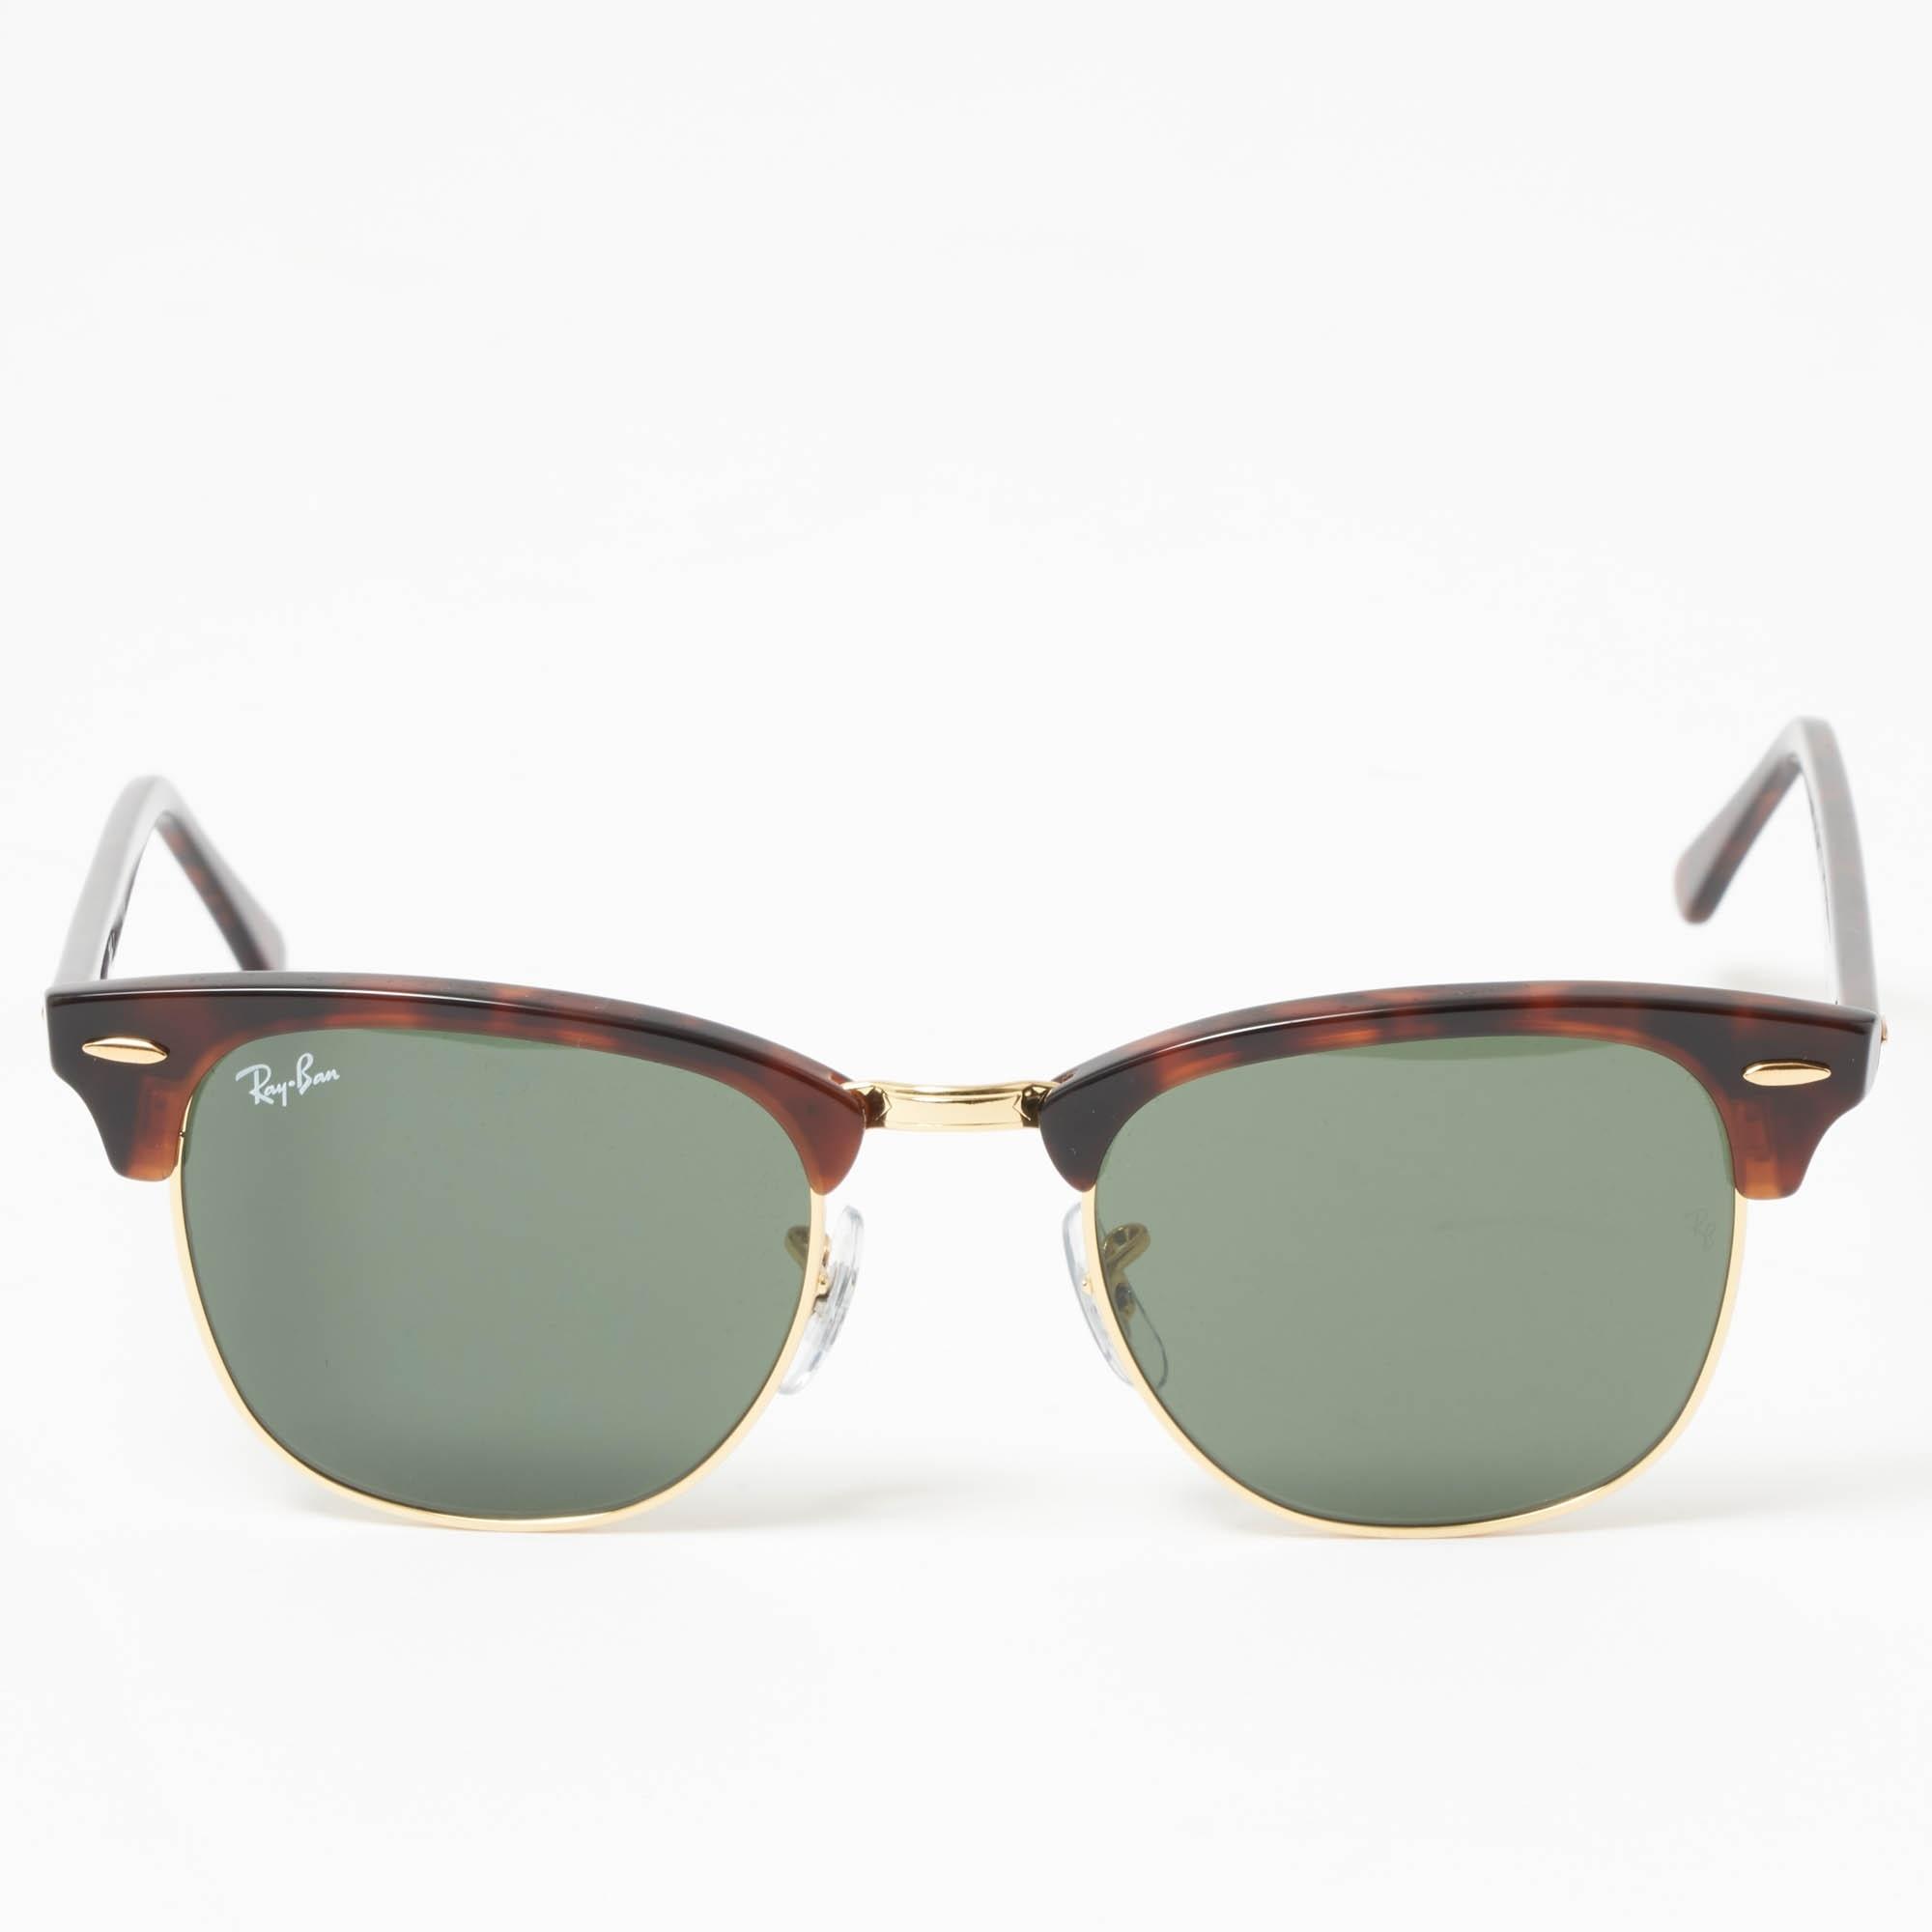 c5c4cd23afb Ray Ban Tortoise Classic Clubmaster Sunglasses - Classic G15 lenses